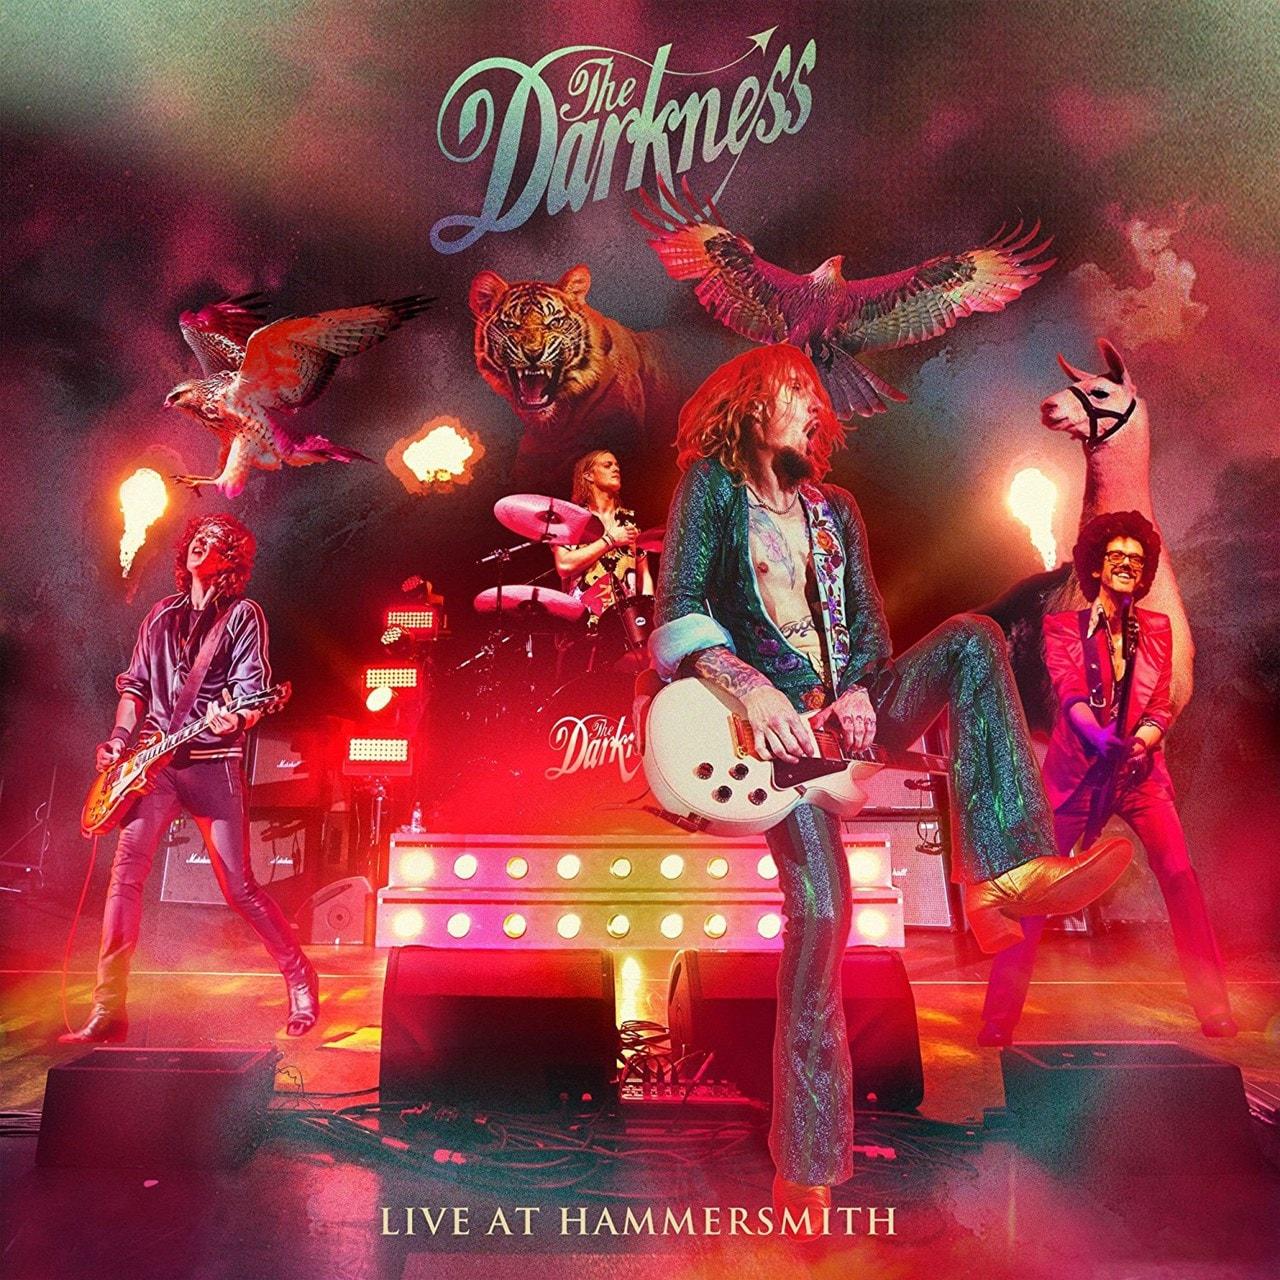 Live at Hammersmith - 1